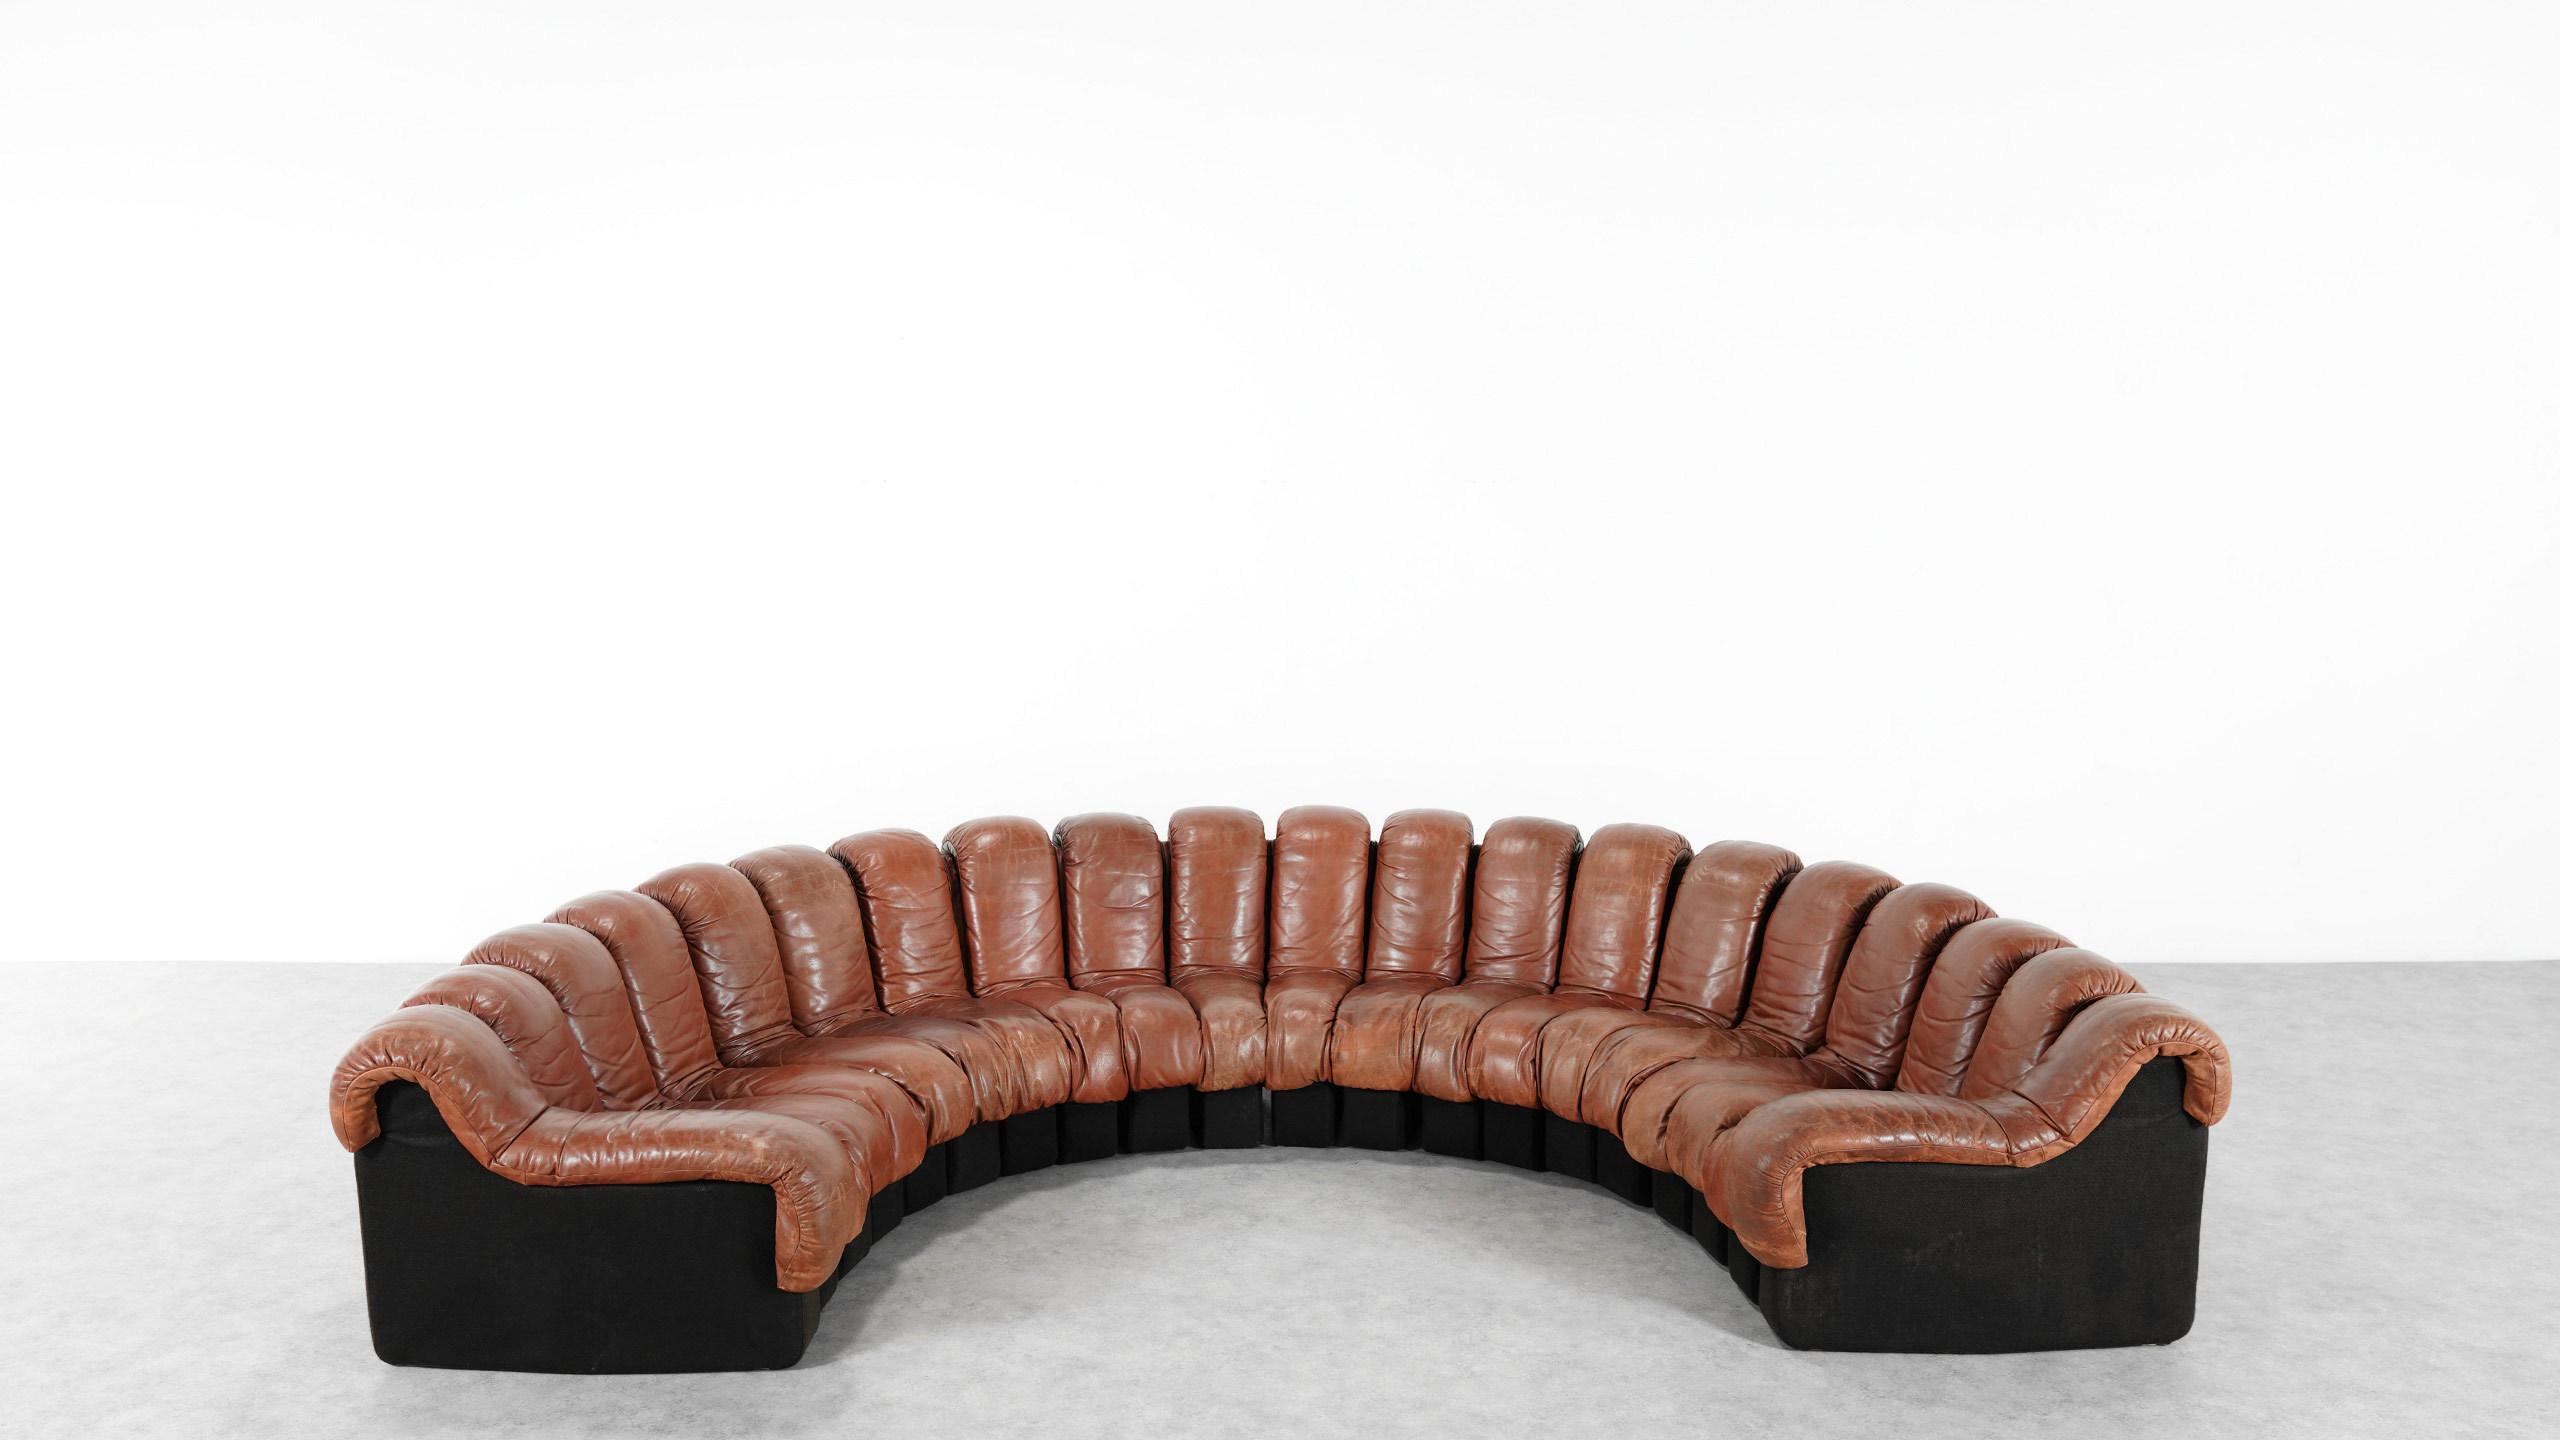 Full Size of De Sede Sofa Ds 600 Chocolate Leather 20 Elements Rundes Bora Kare Loddenkemper Schlafzimmer Lounge Garten Heizkörper Badezimmer Terassen Mit Bettfunktion Sofa De Sede Sofa